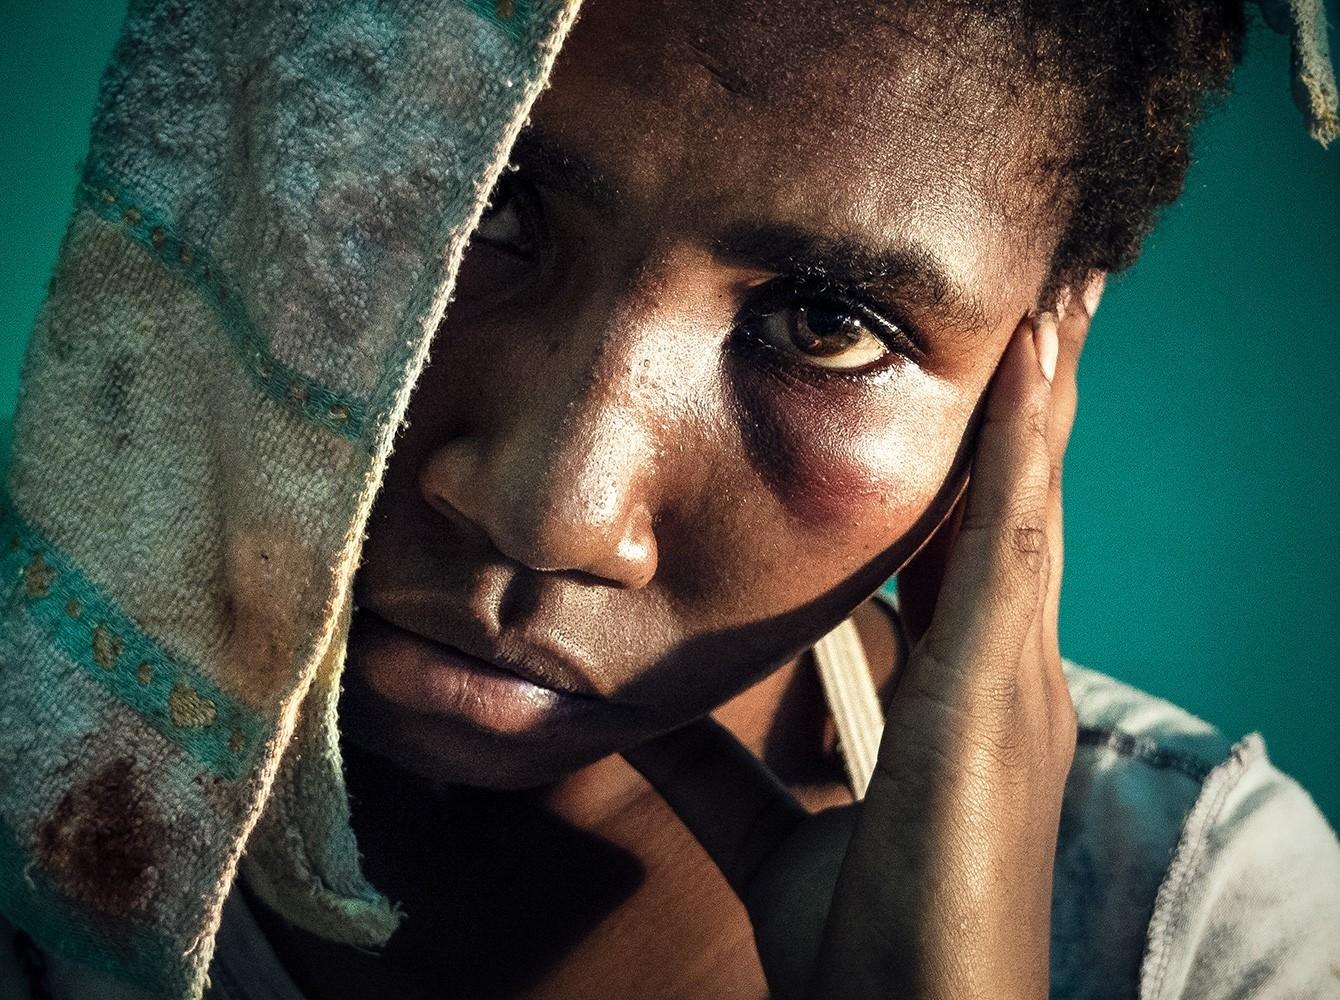 A survivor of sexual violence. Photo by Vlad Sokhin